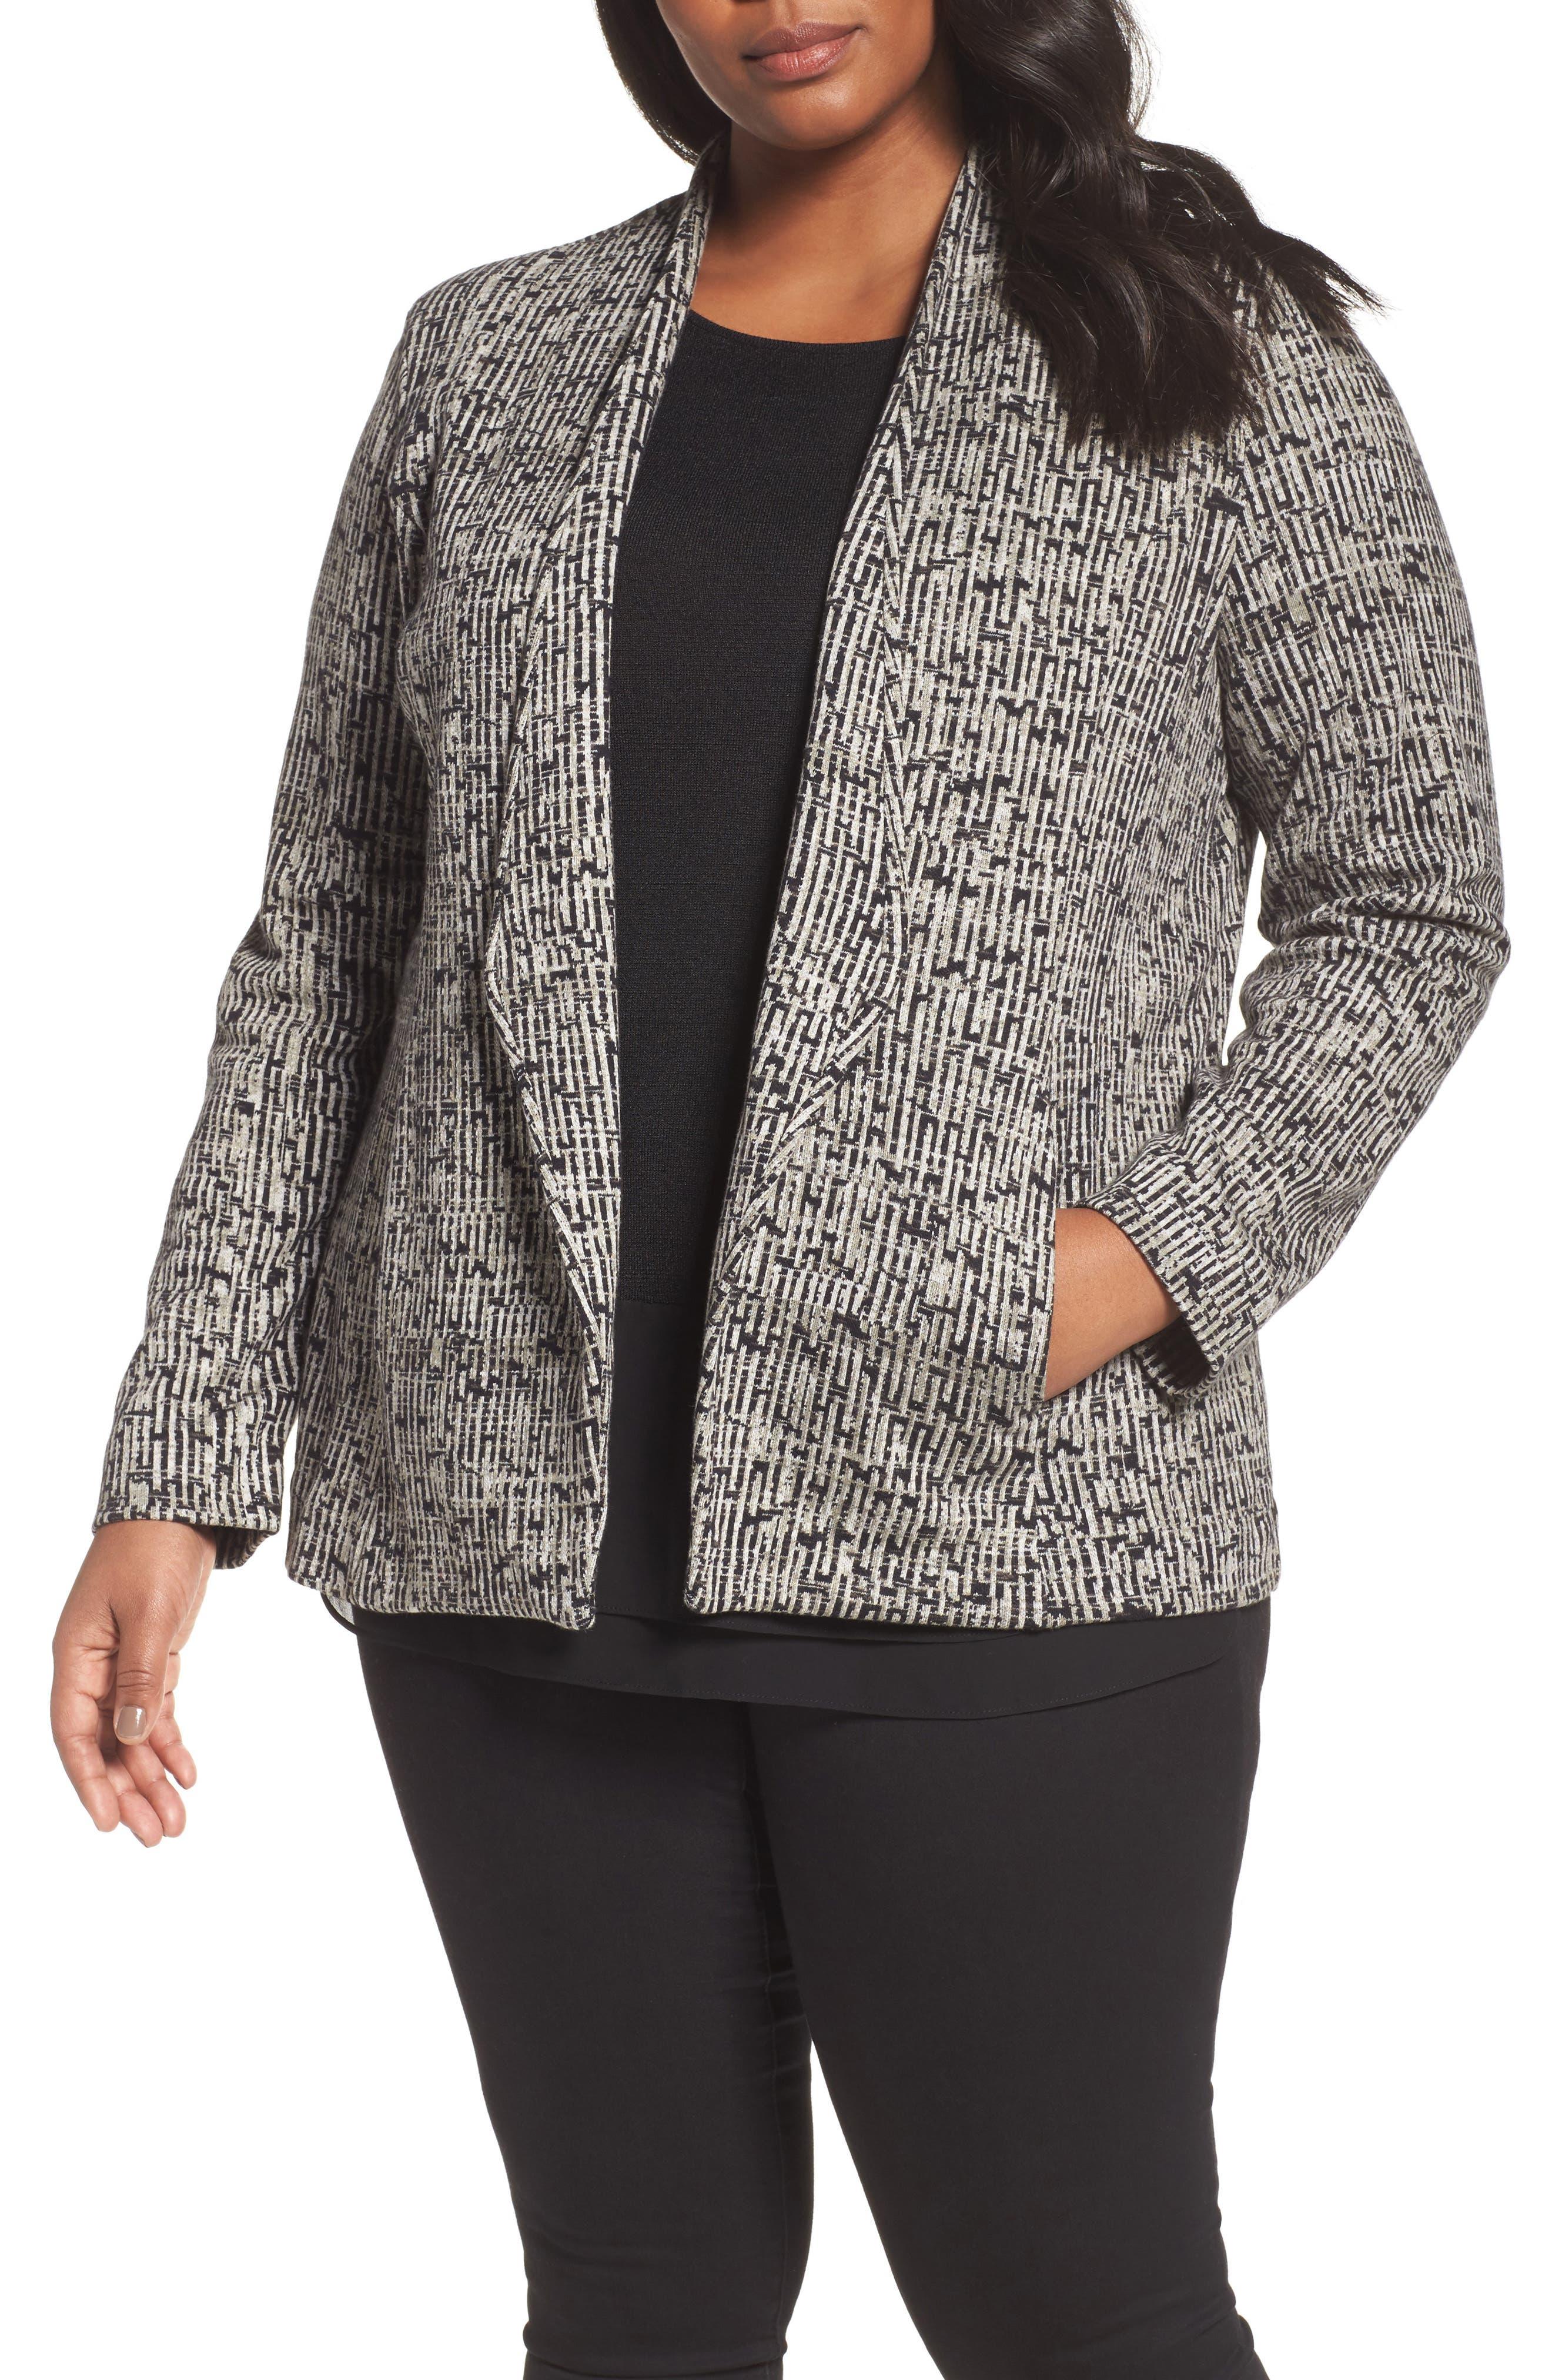 Trail Blazer Jacket,                         Main,                         color, BLACK MULTI